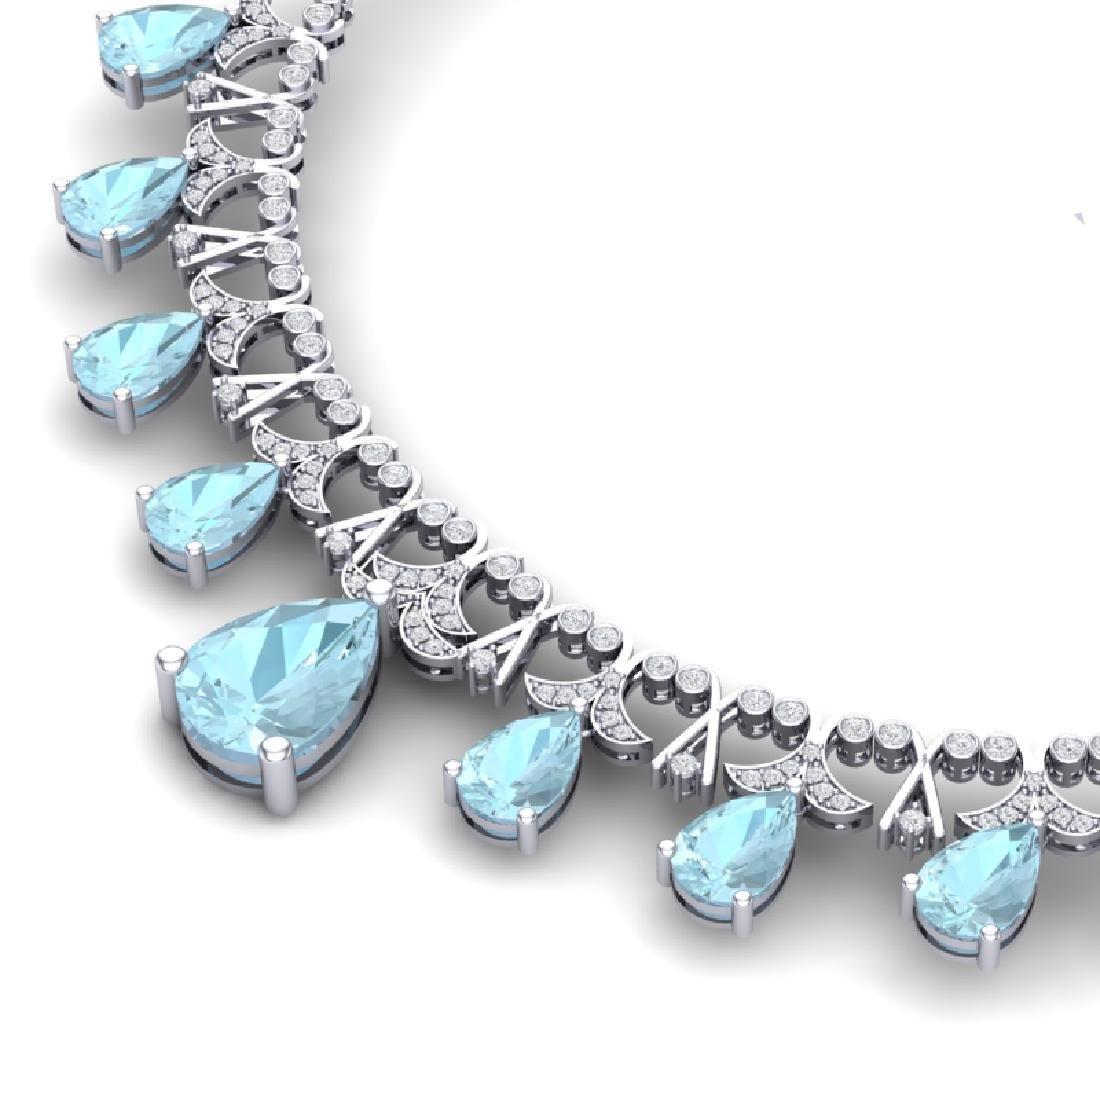 60.62 CTW Royalty Sky Topaz & VS Diamond Necklace 18K - 2